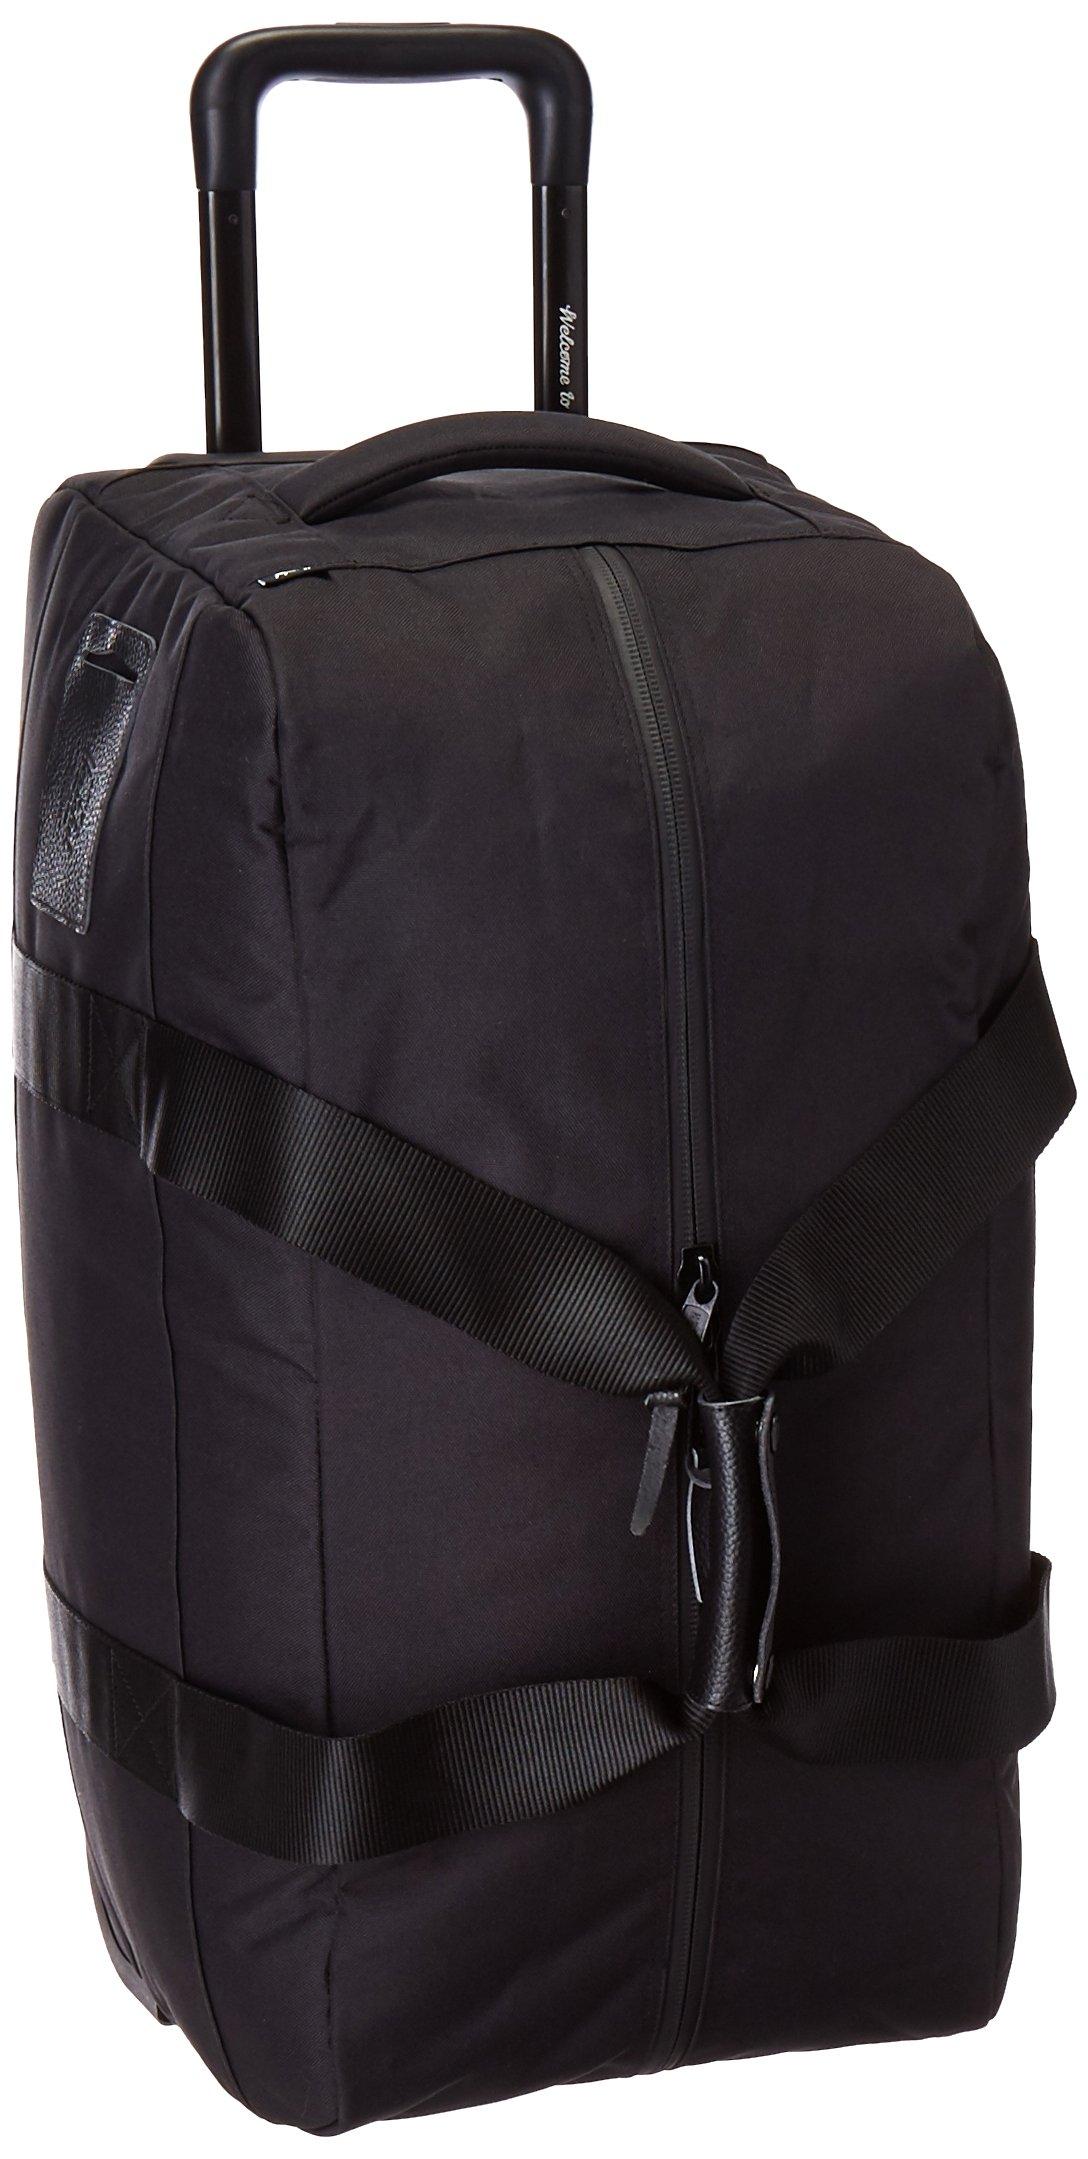 Herschel Supply Co. Wheelie Outfitter Duffle Bag, Black